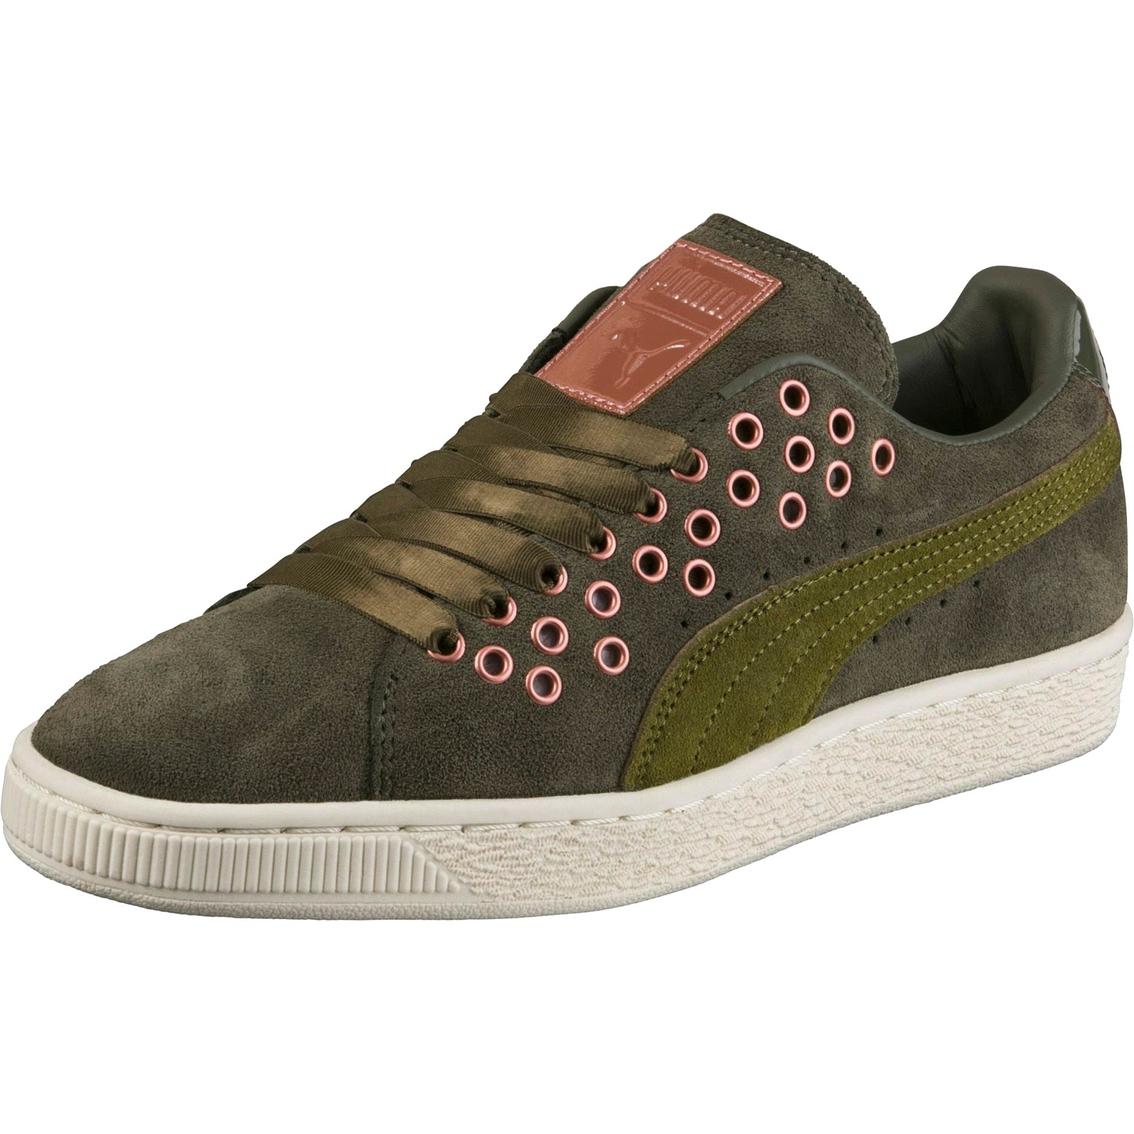 49aa80868c9f Puma Women s Sportstyle Suede Xl Lace Vr Sneakers